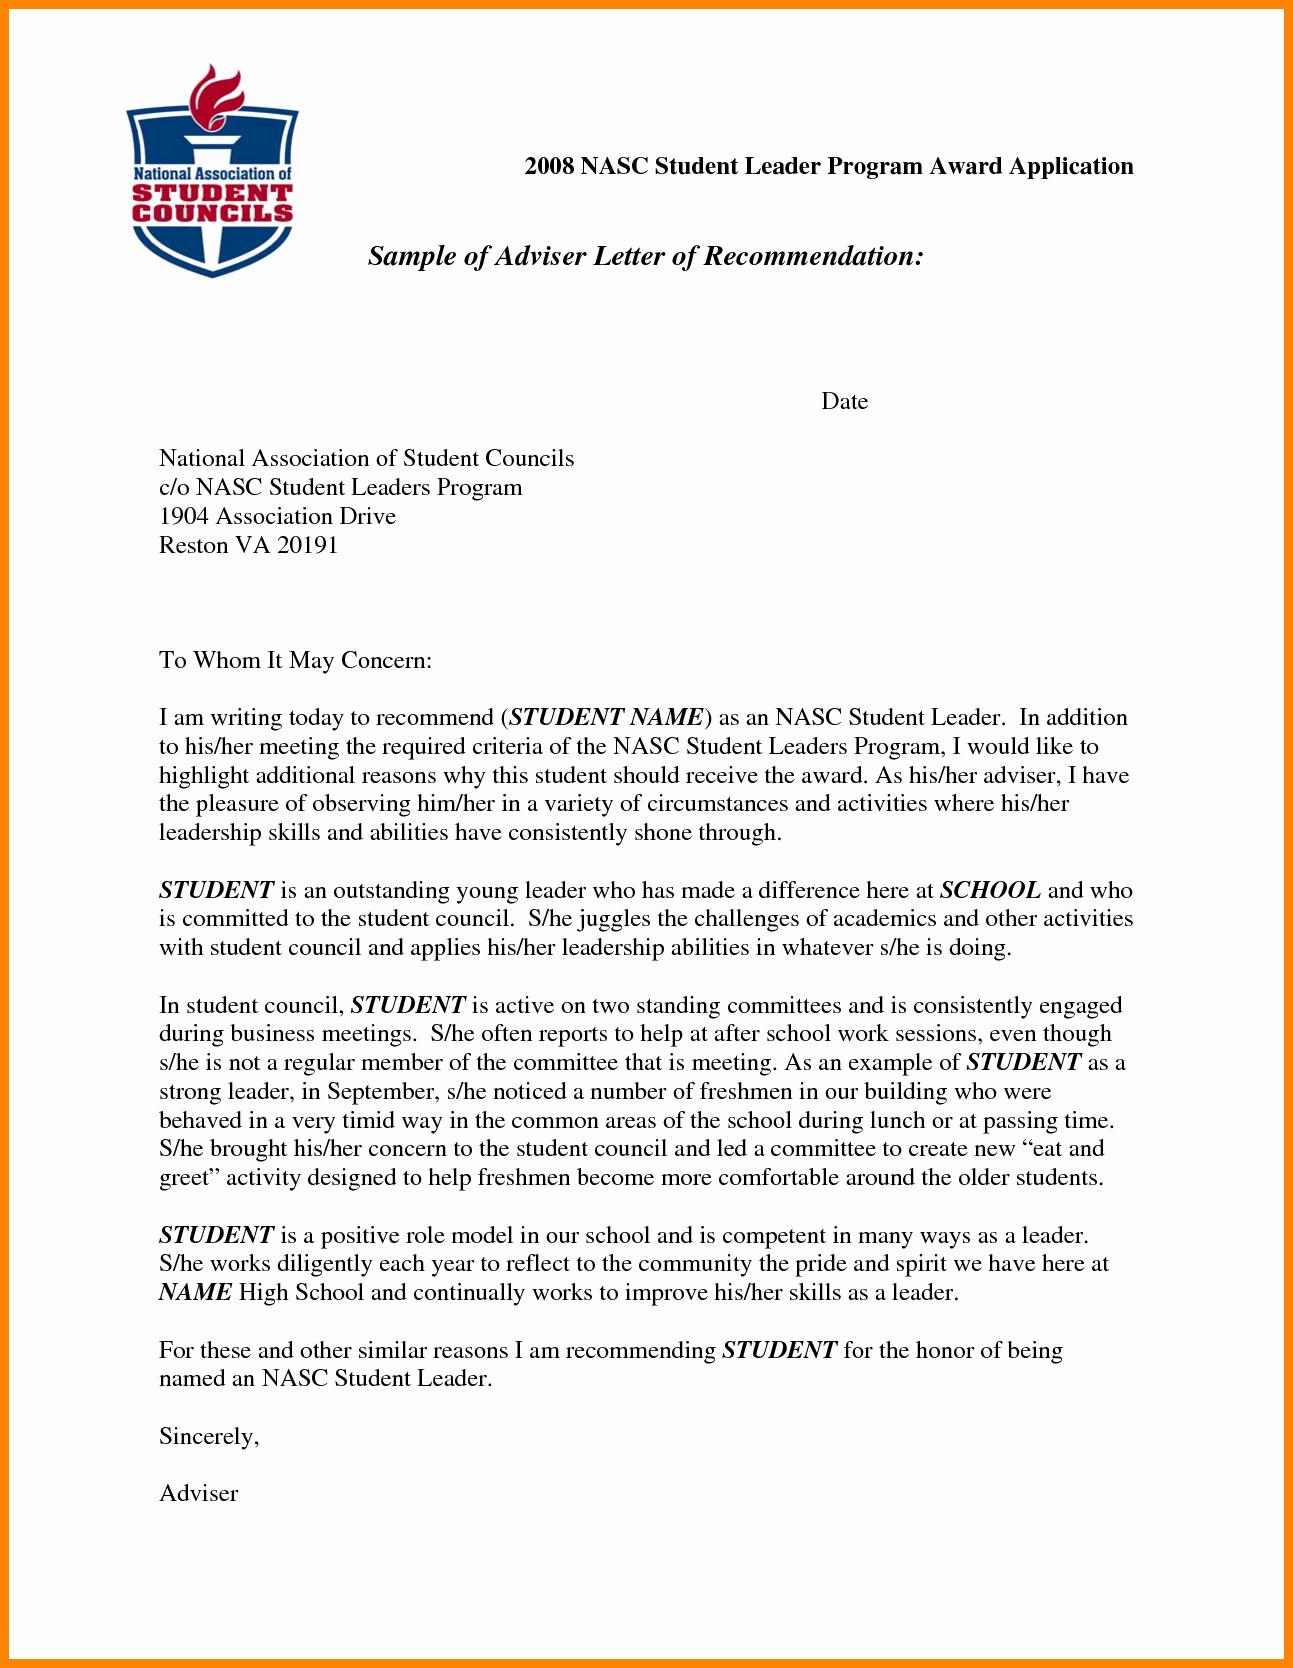 Letter Of Recommendation Template Student Lovely 5 Re Mendation Letter Sample for Student Scholarship